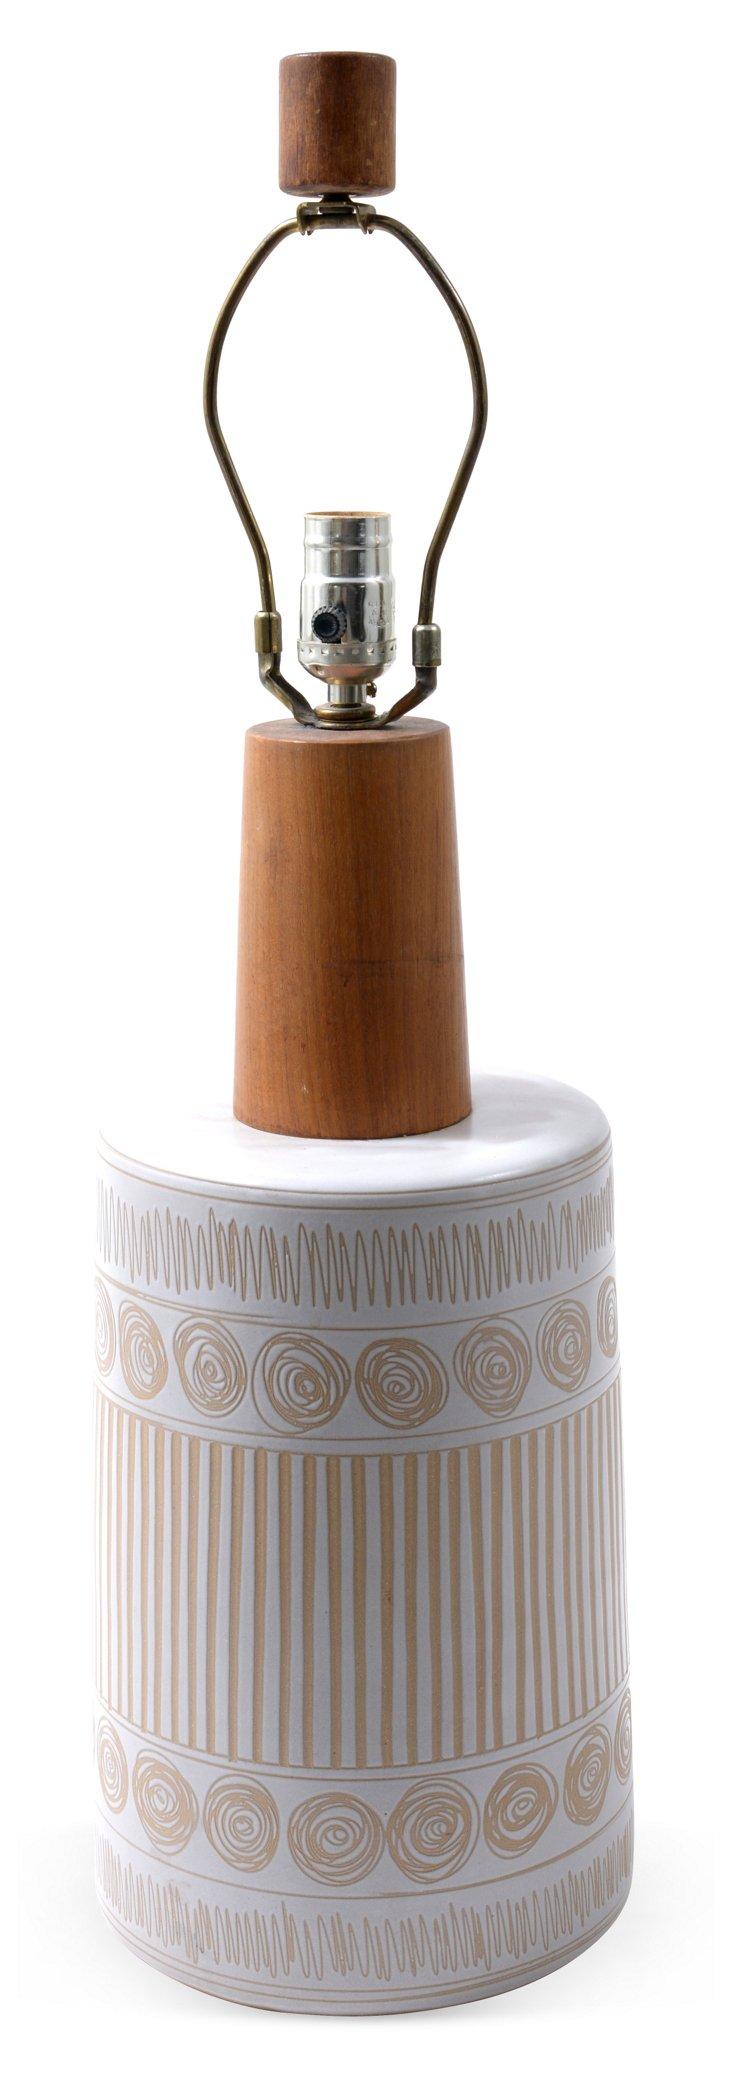 Martz Table Lamp II